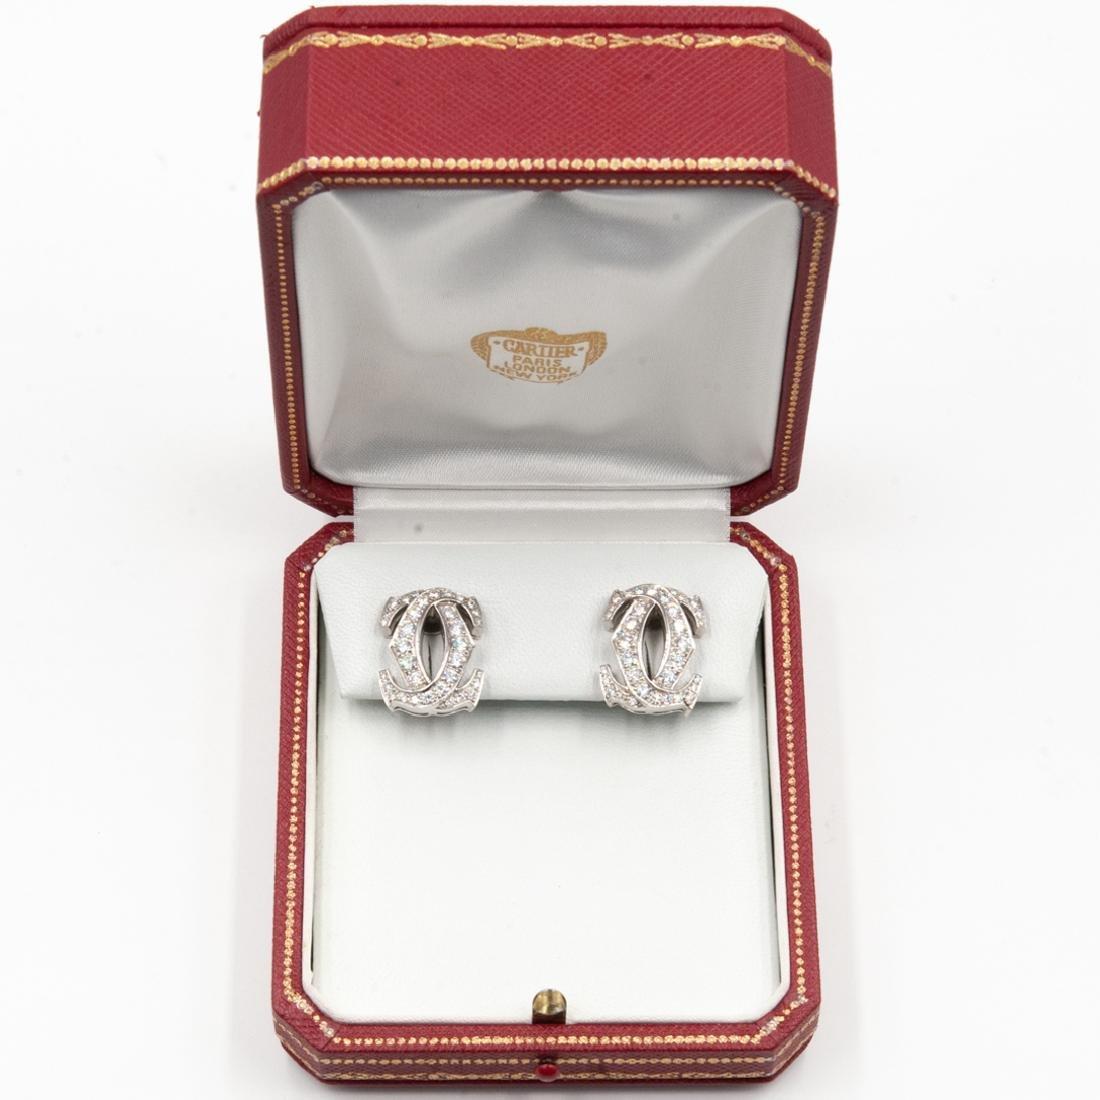 Pair of 18K Cartier C de Cartier Diamond Earrings - 5